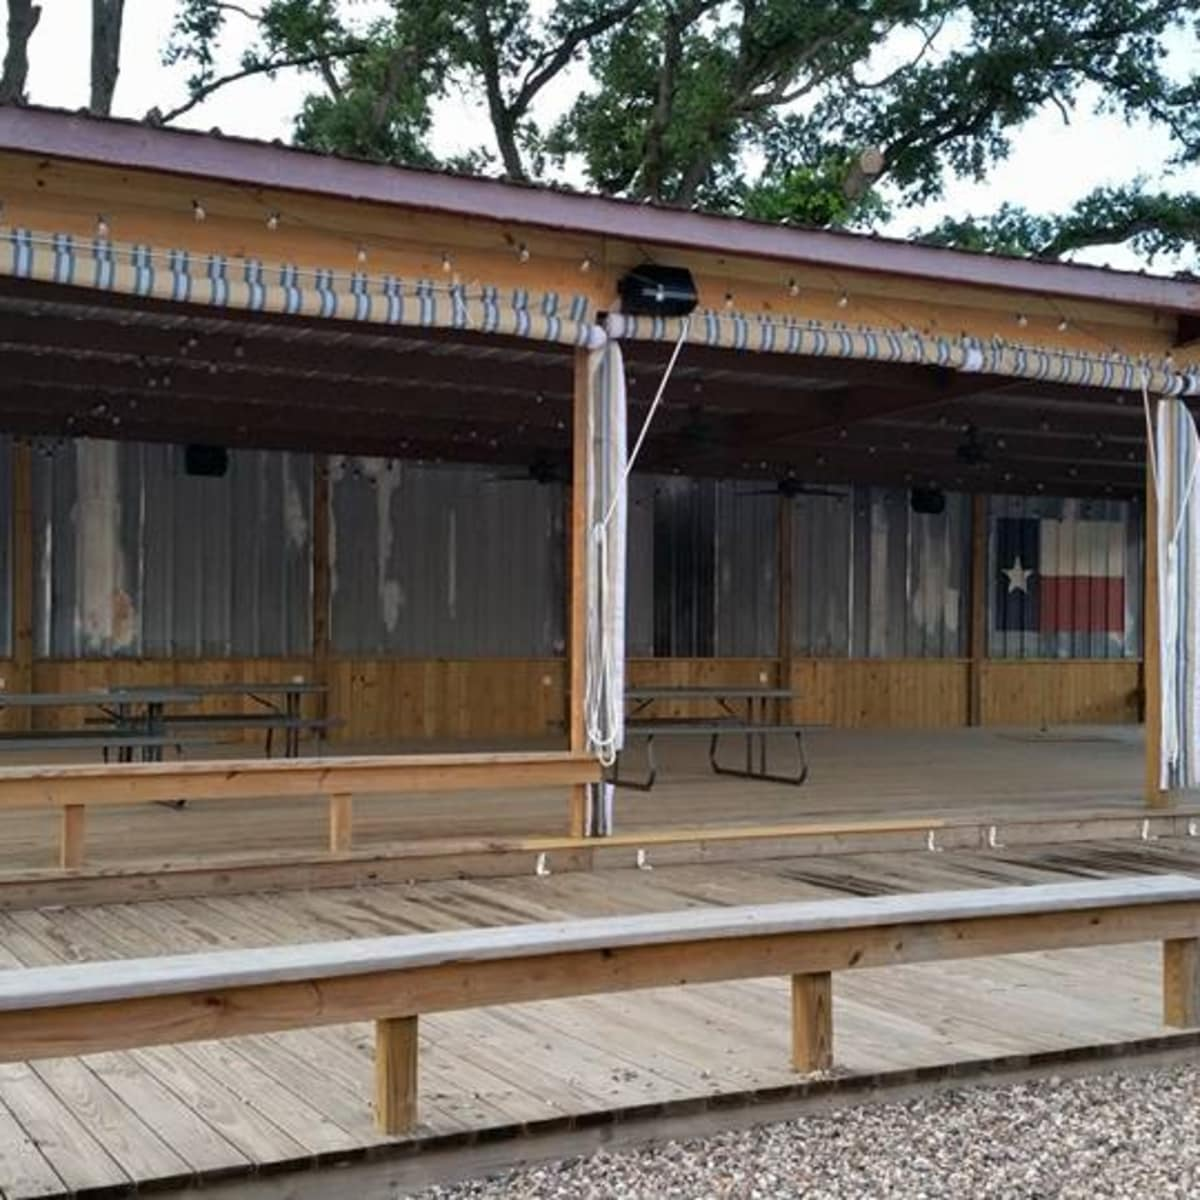 Bernie's Backyard food truck park Spring